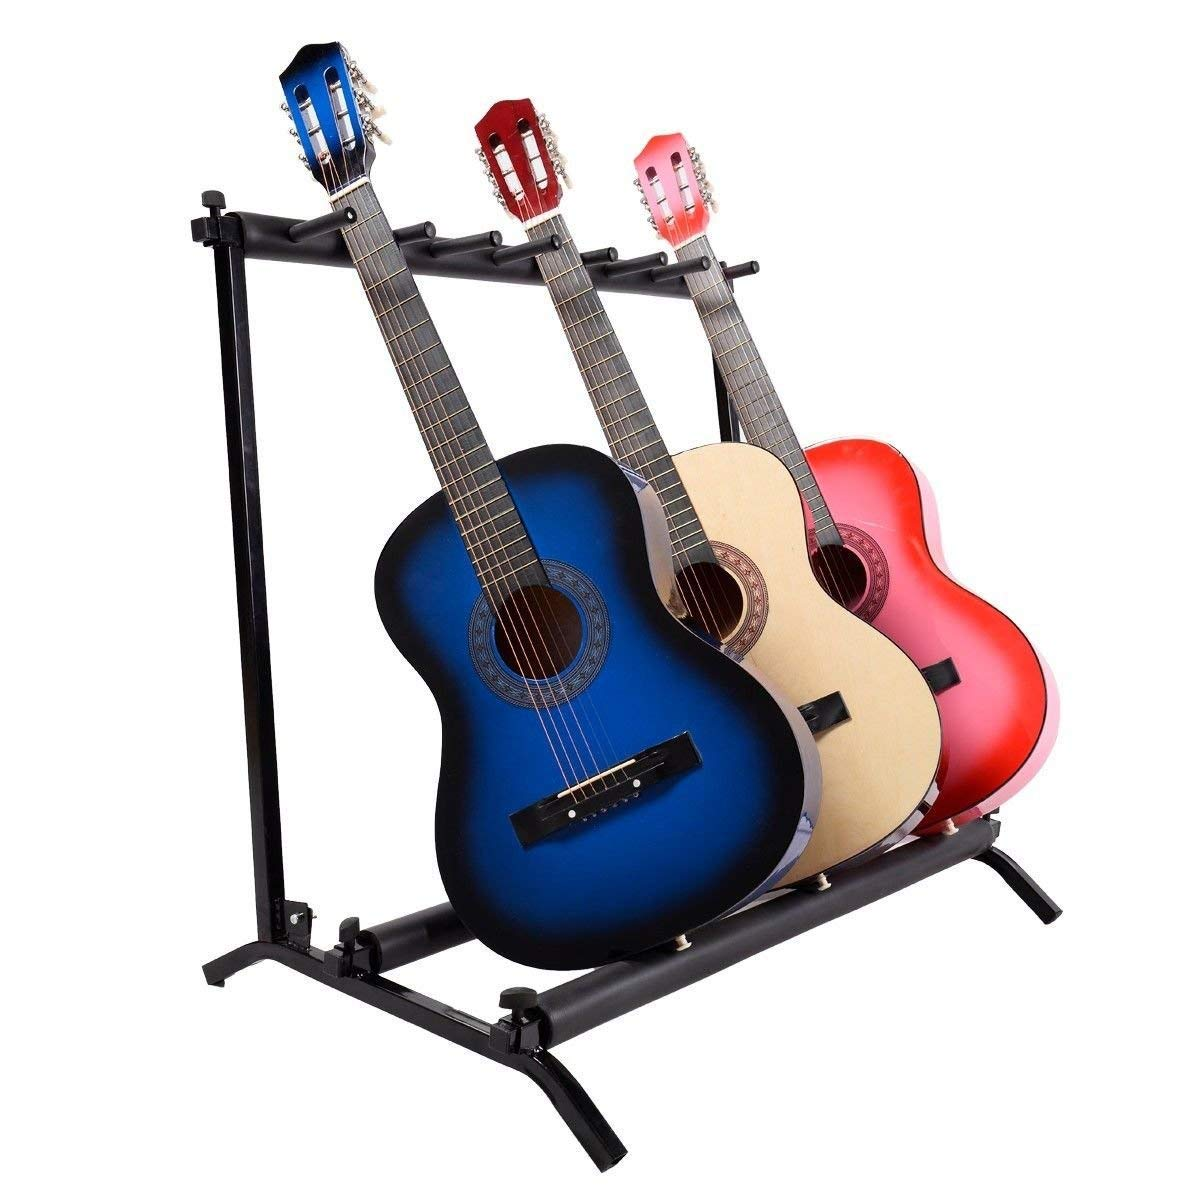 Costzon 7 Piece Guitar Rack Multi-Instrument Holder Stand Acoustic Bass Display Storage Organizer